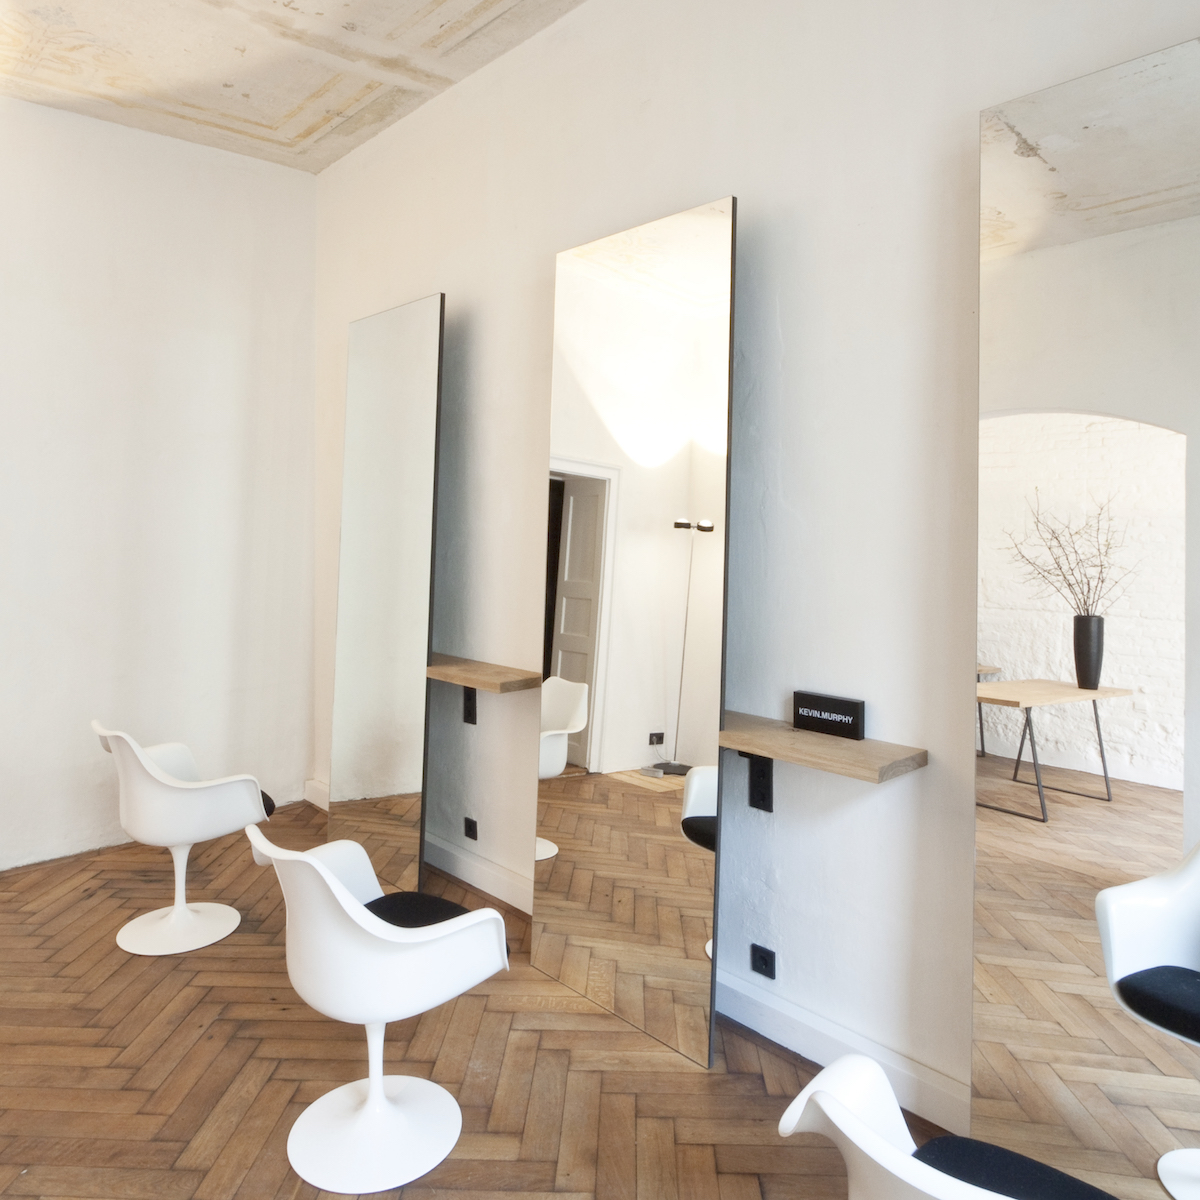 Dressler Friseur Salon Schwabing_Inside